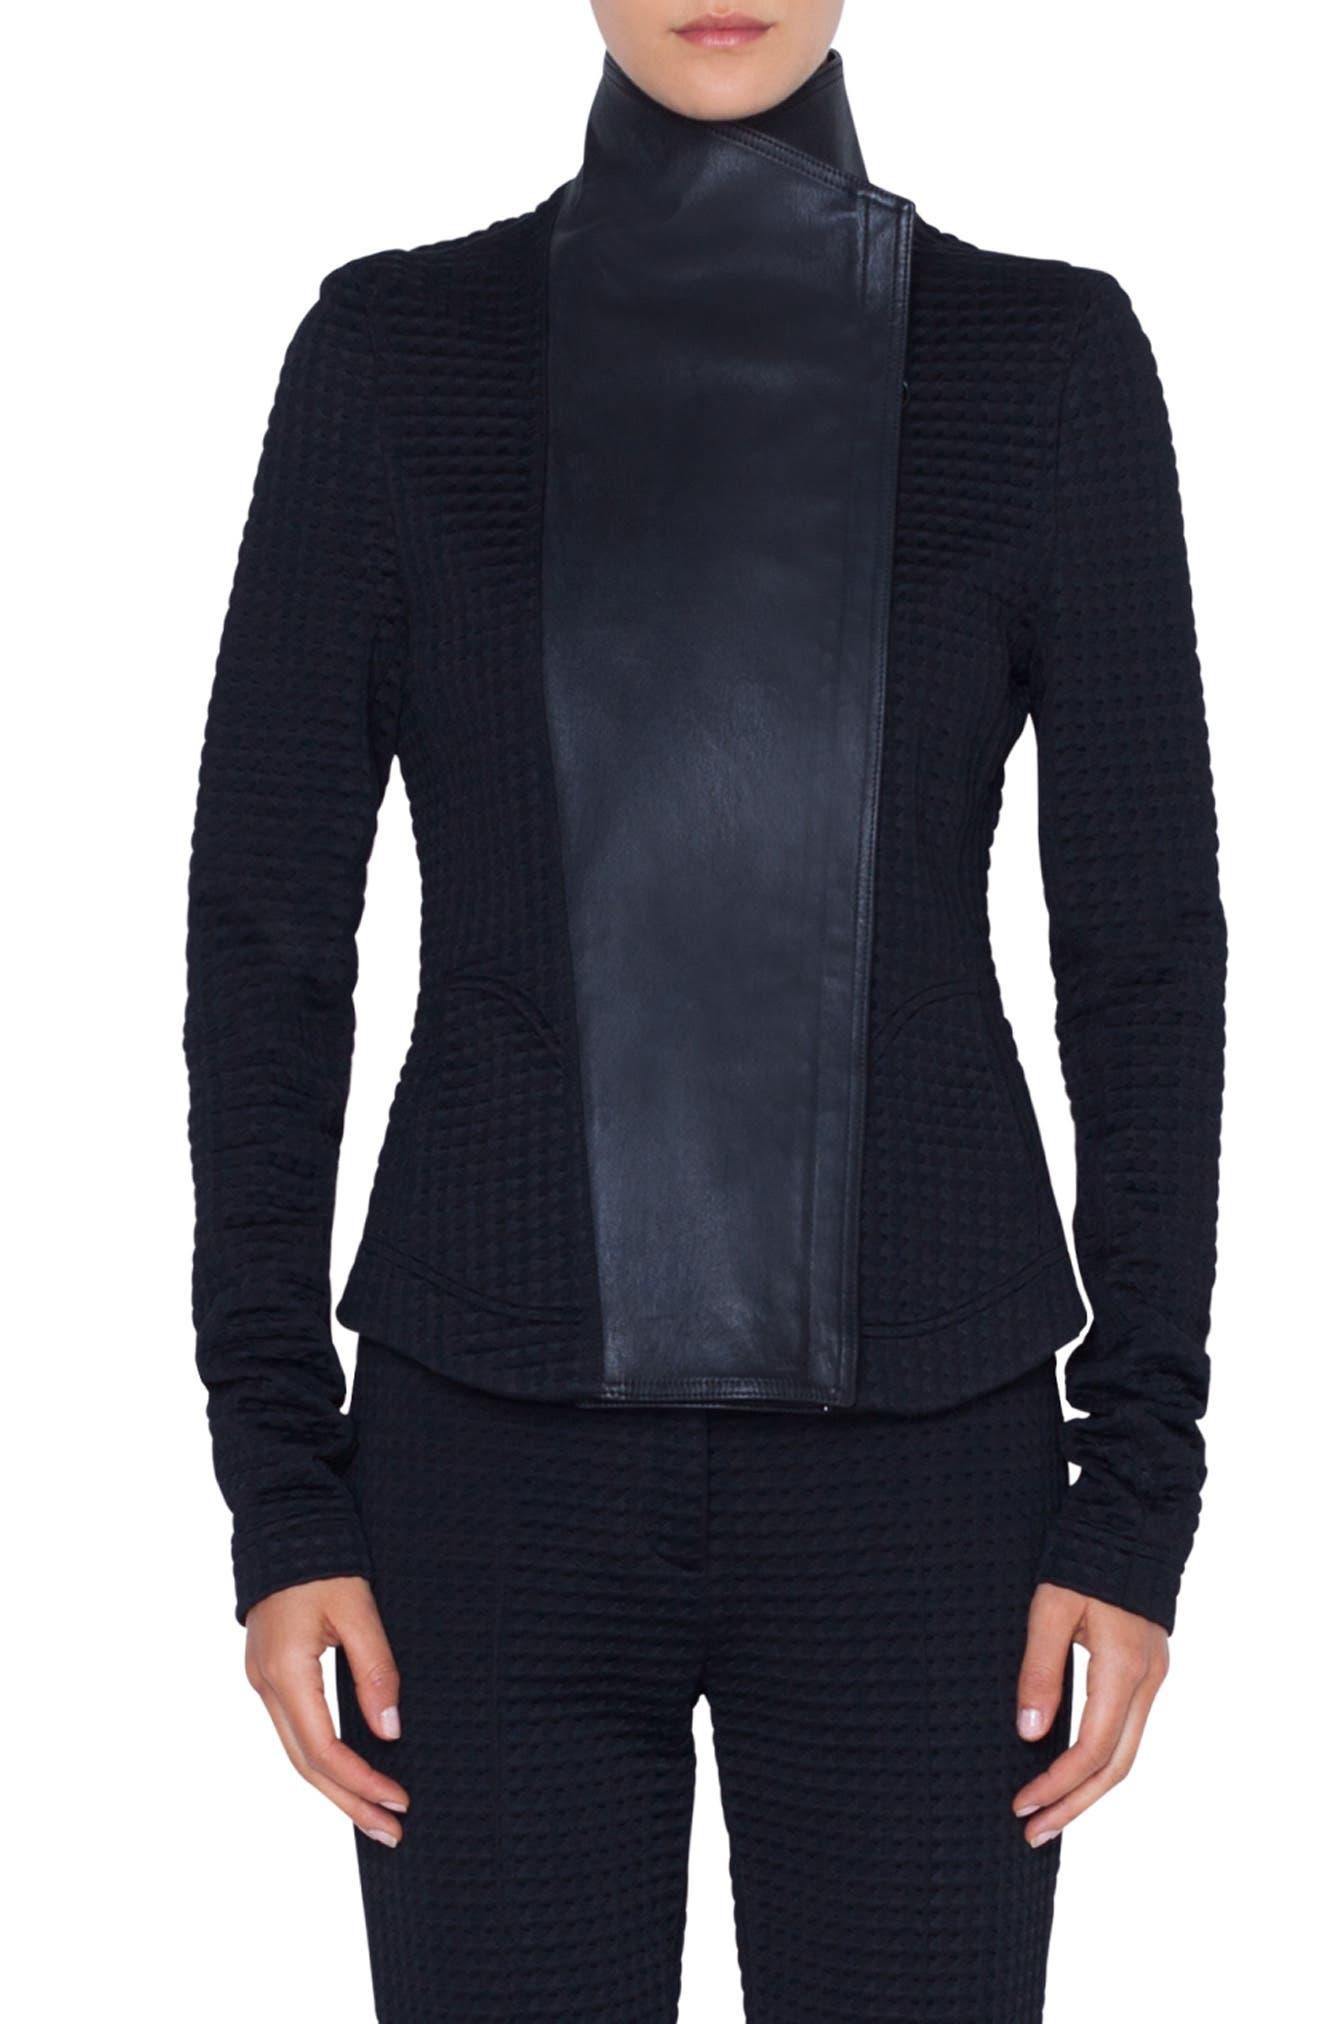 AKRIS PUNTO Leather & Jersey Biker Jacket, Main, color, NERO